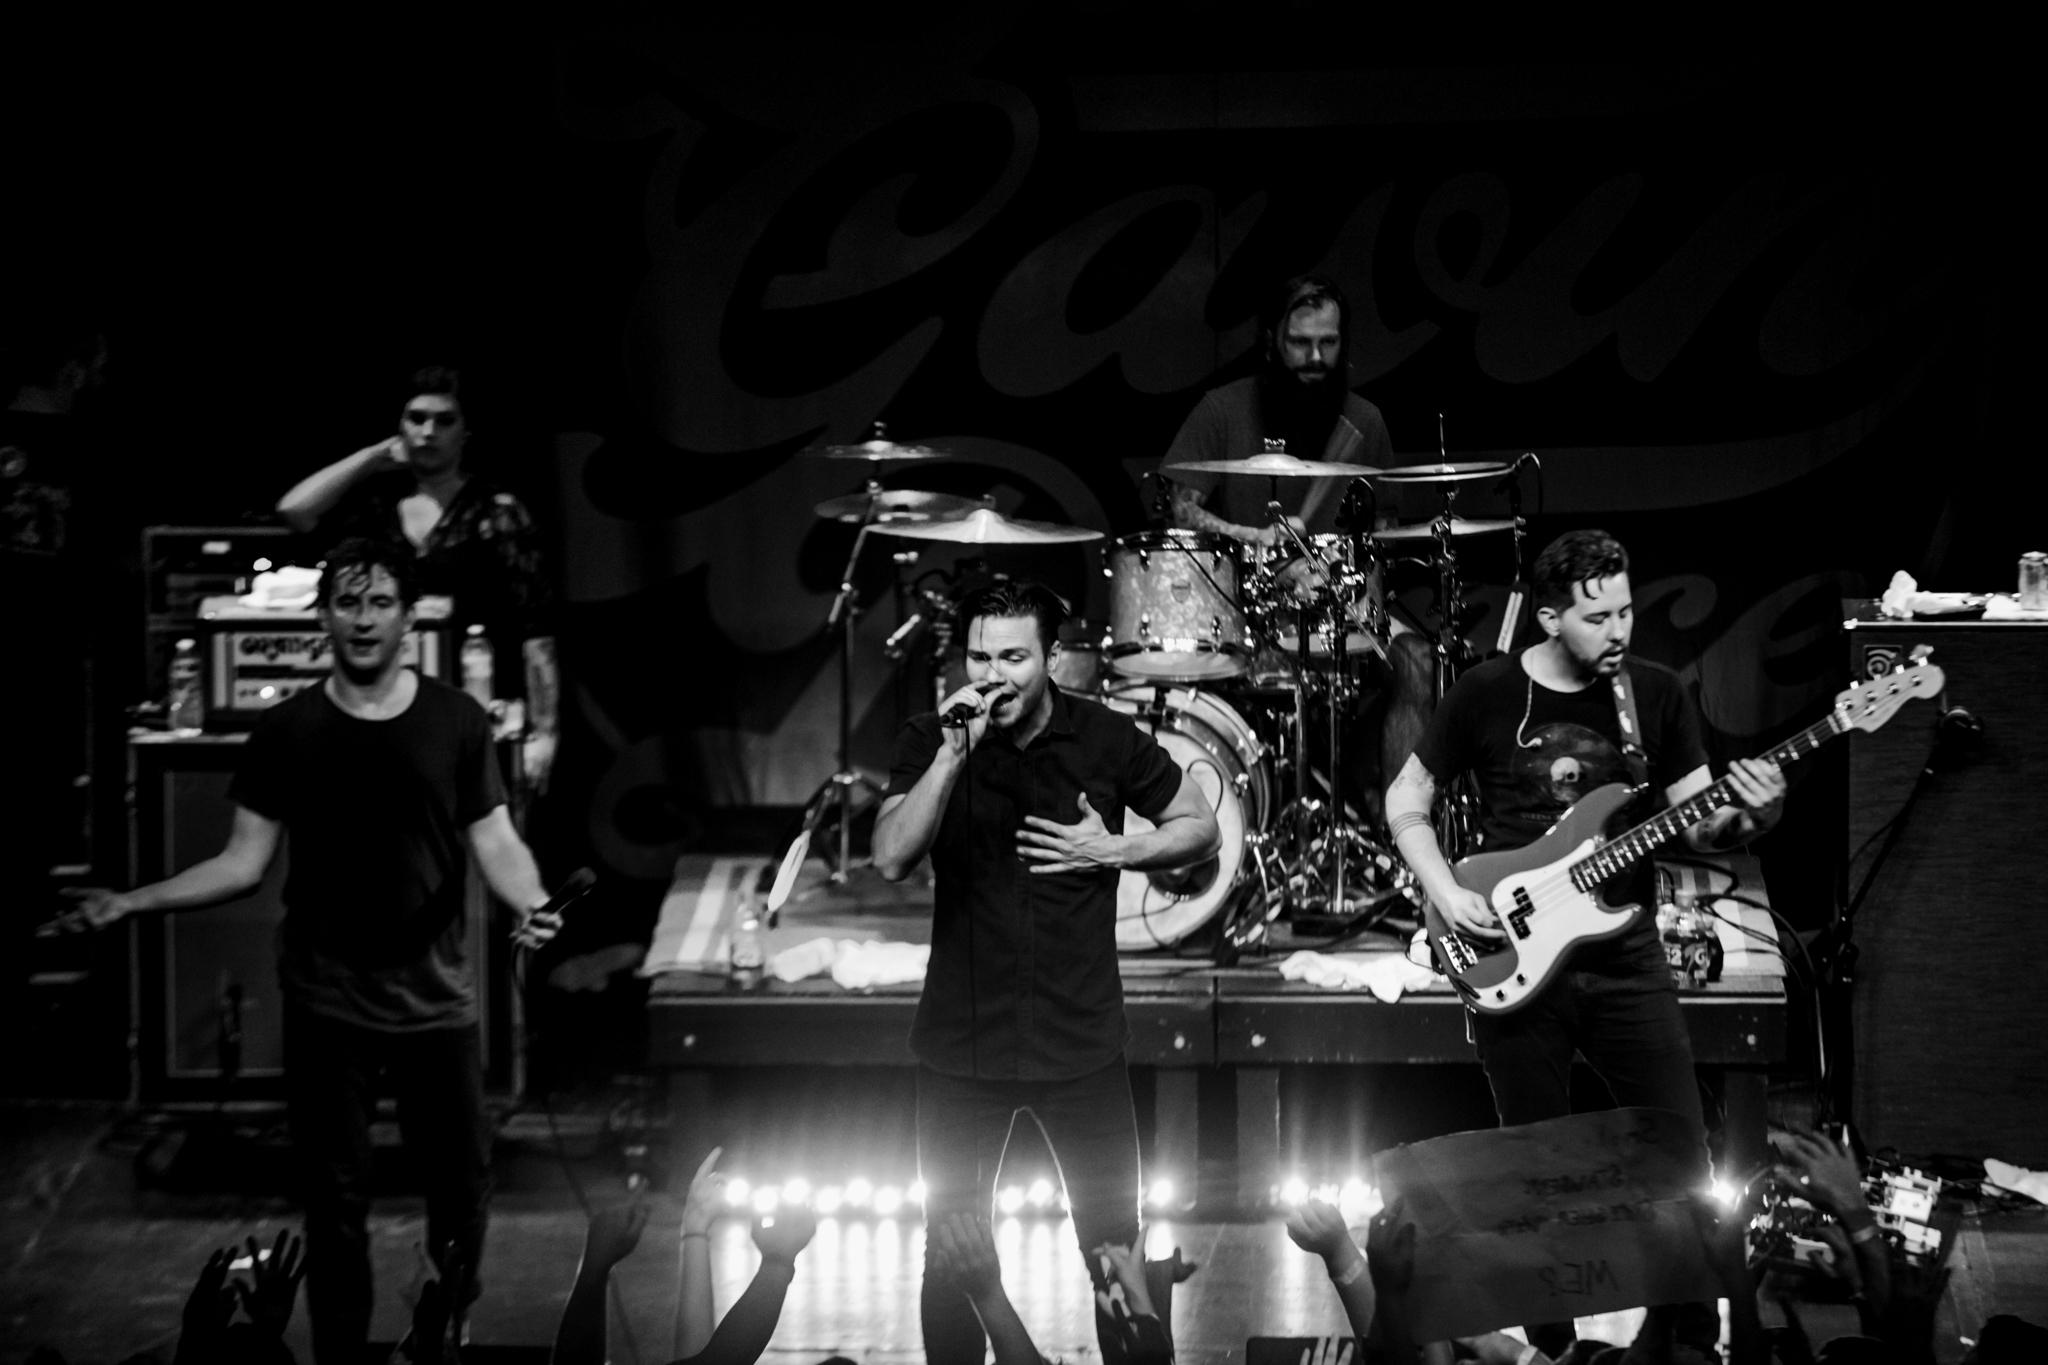 Lafferty Photo - Dance Gavin Dance 03.08.17-8666.jpg